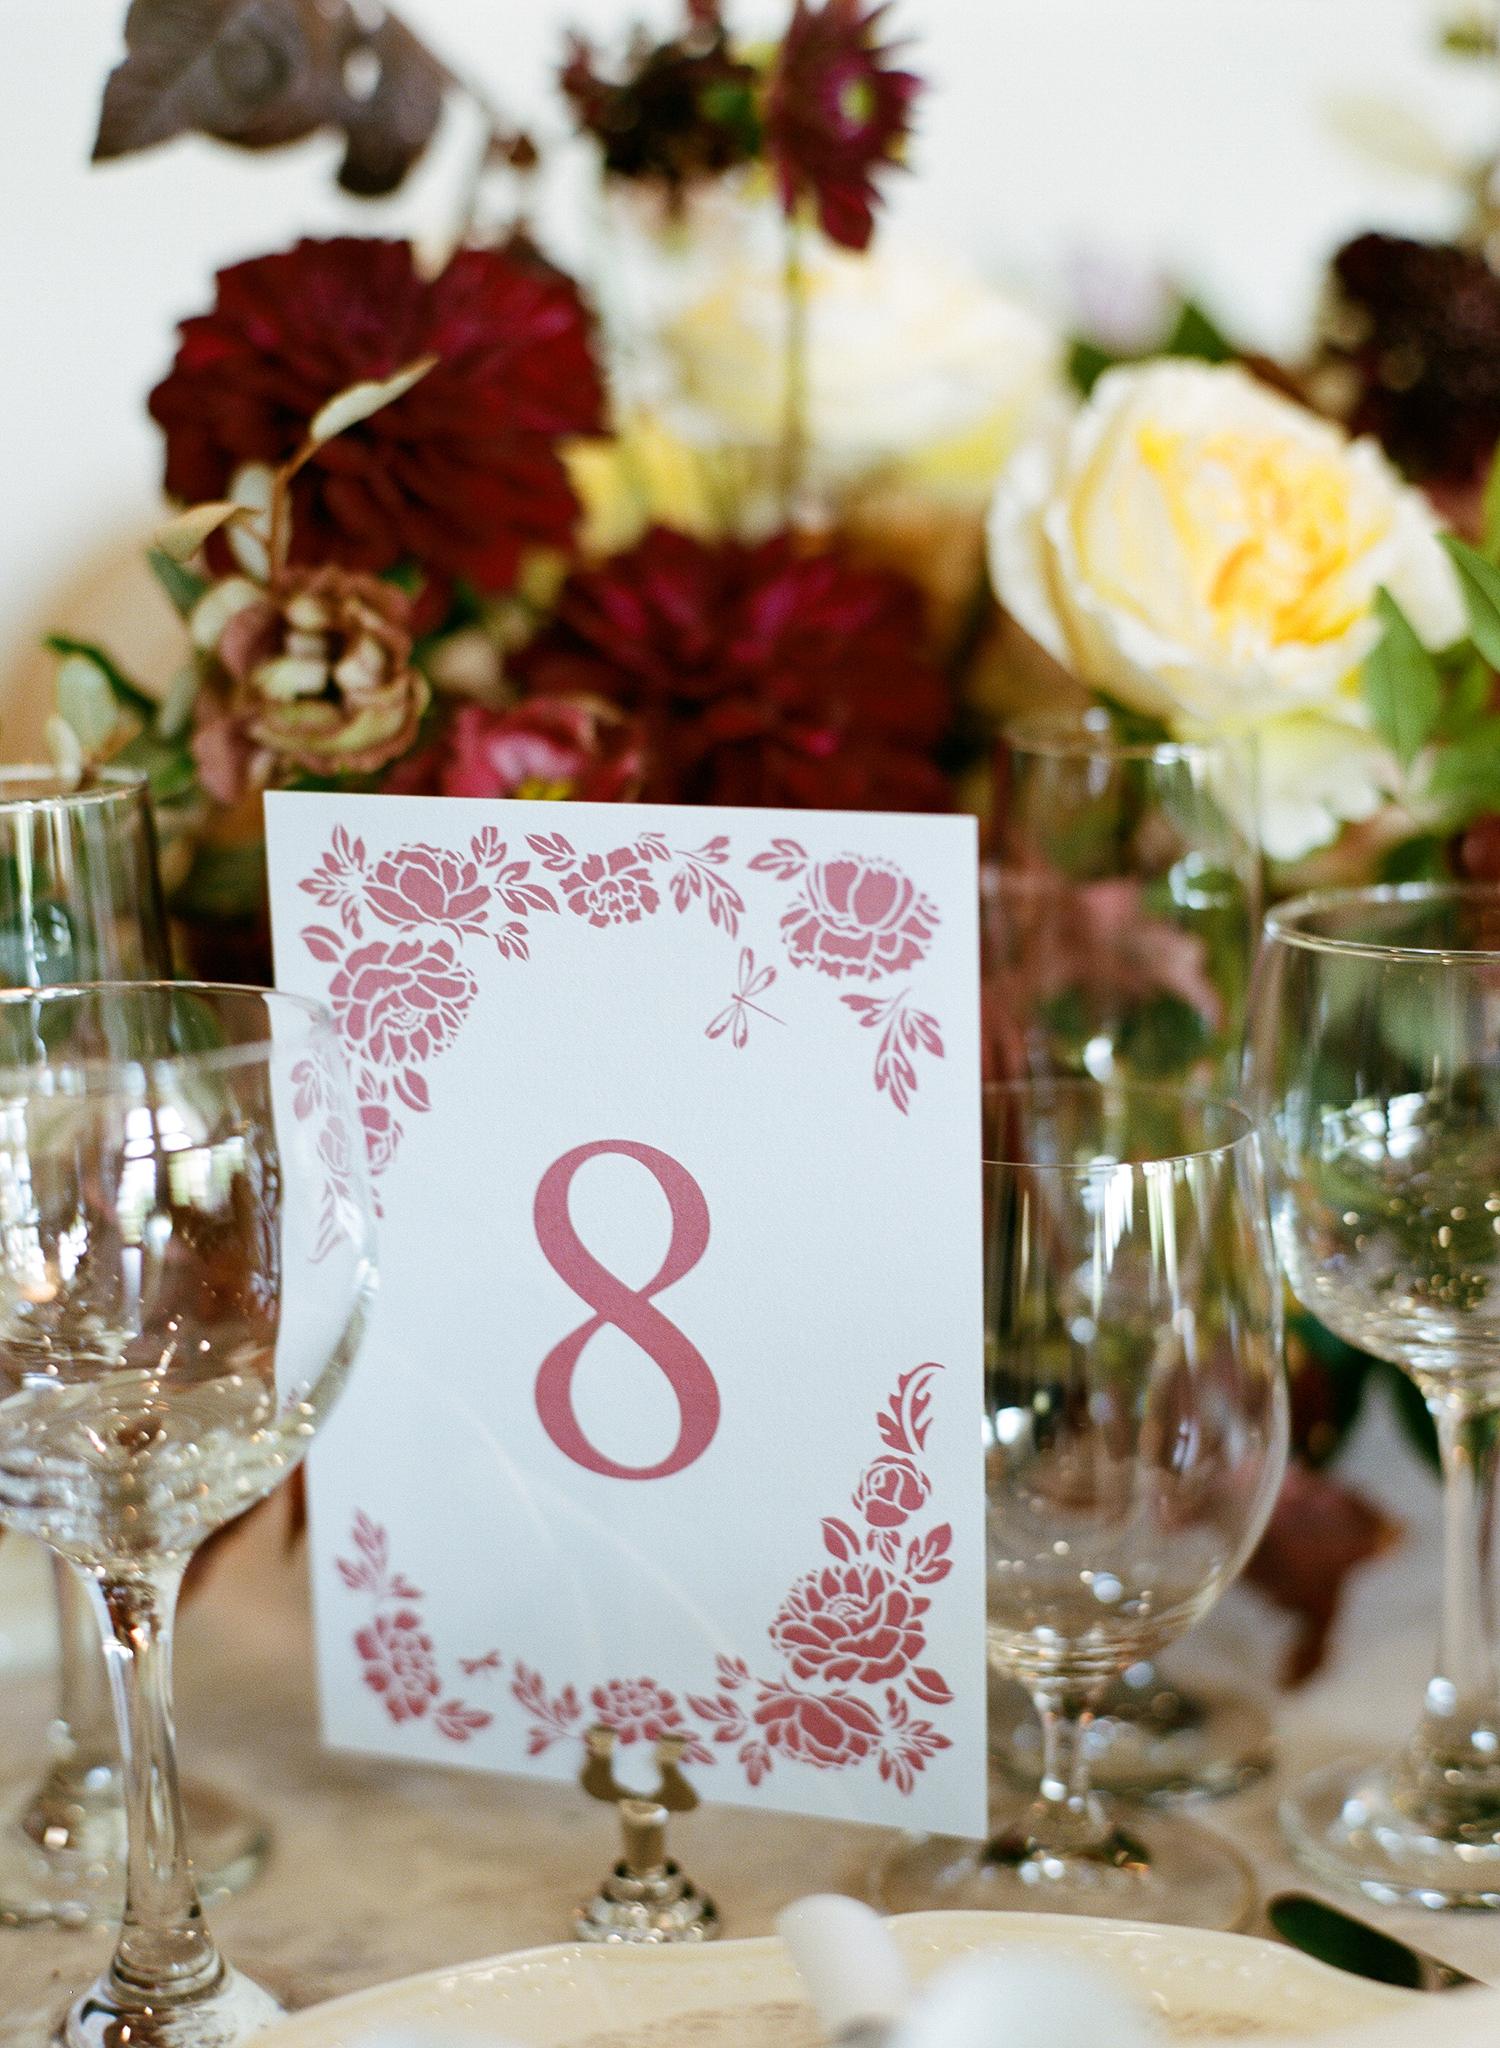 ivana nevin wedding table number